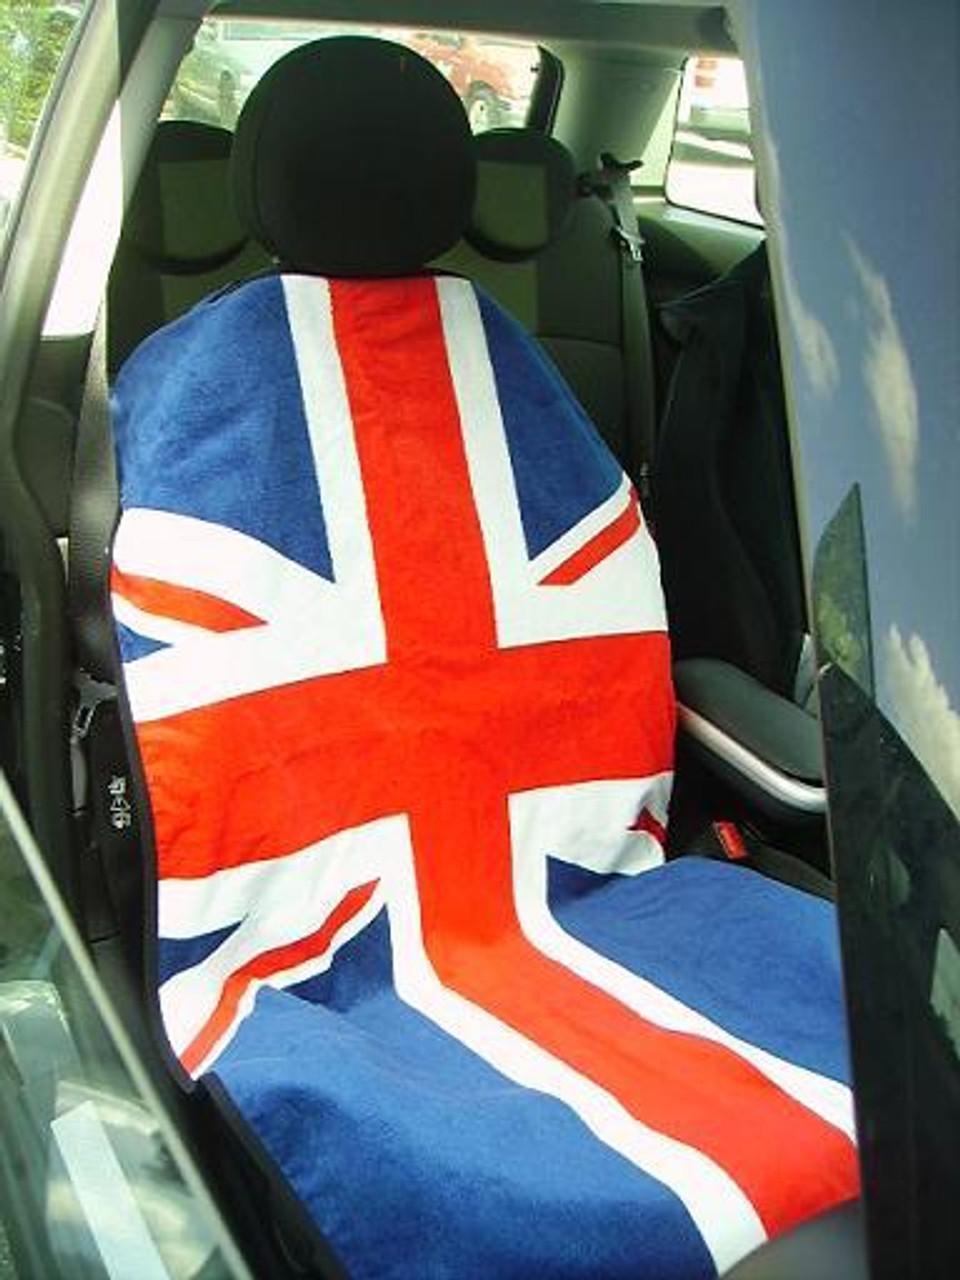 Mini Cooper Union Jack Red White Blue Car Seat Cover Towel